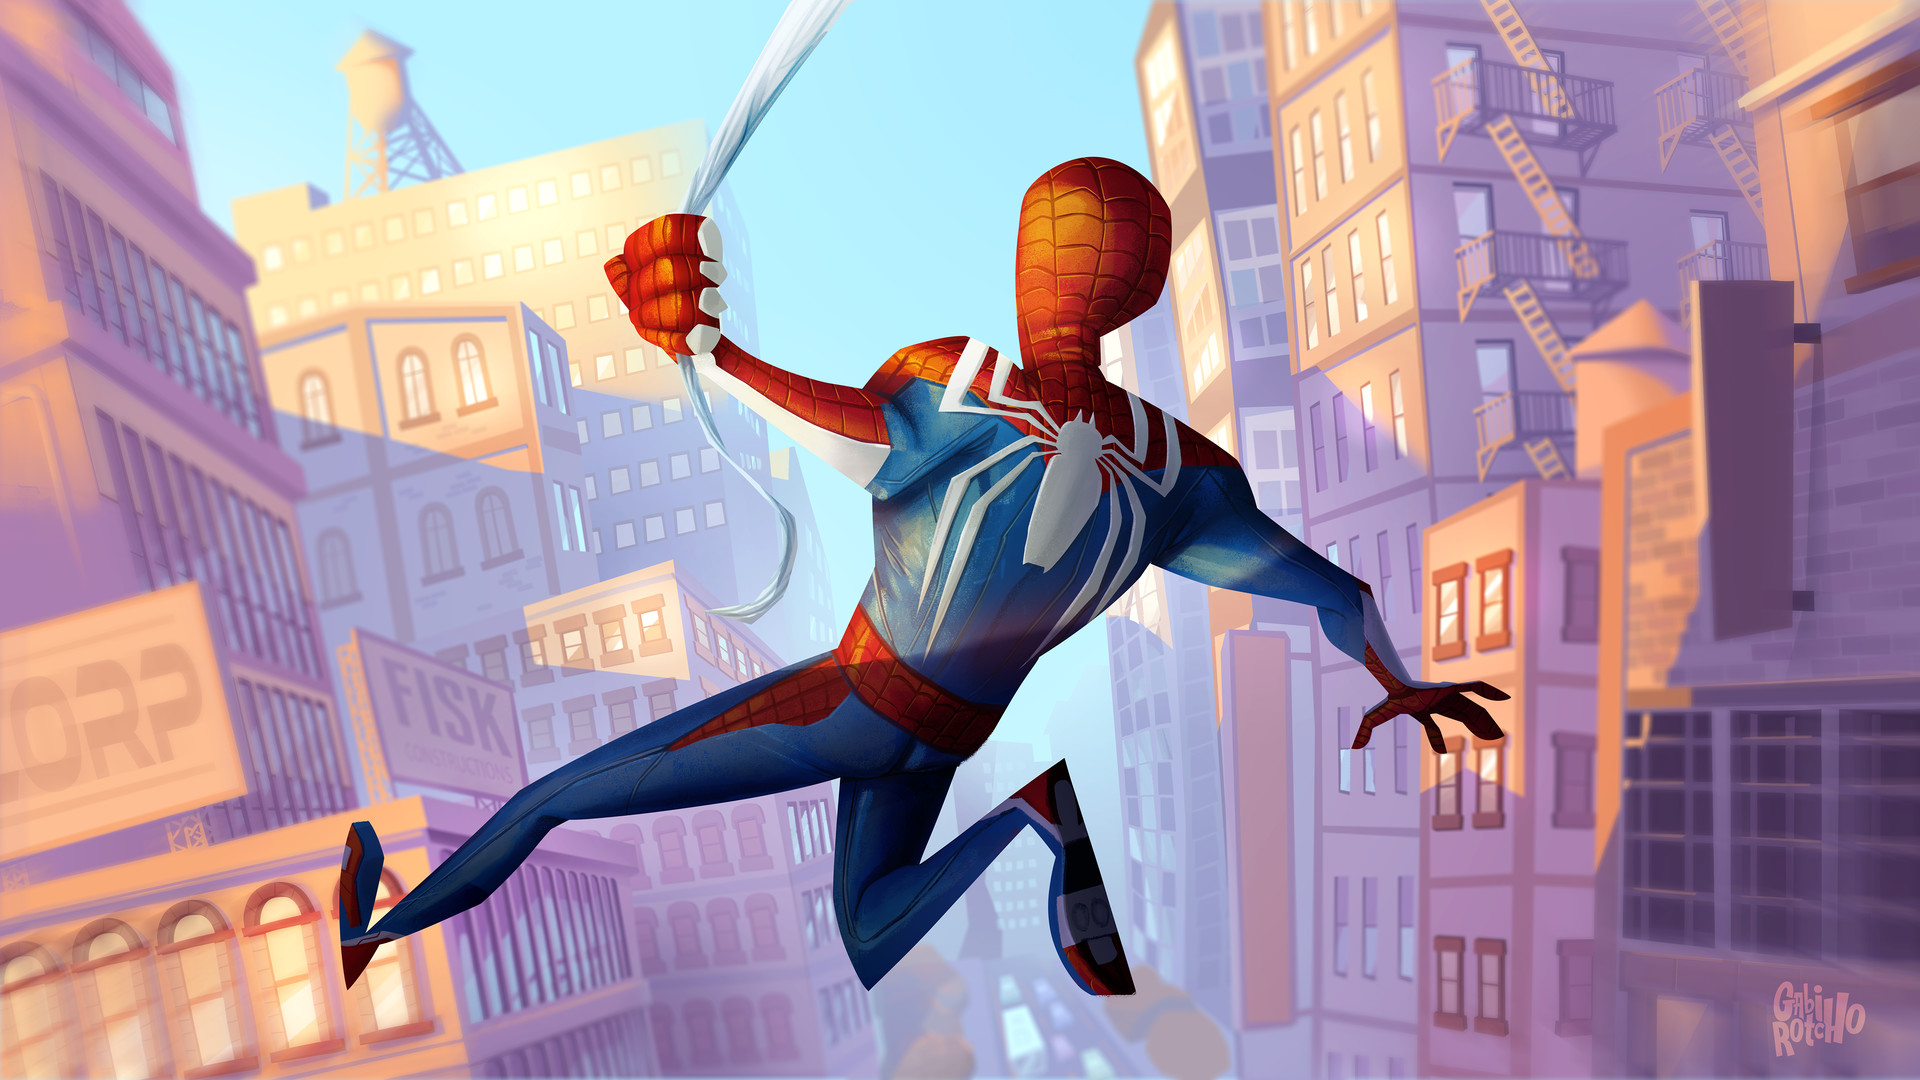 Wallpaper Spider Man 2099 Fan Art 4k Creative Graphics: Spider Man Ps4 Fanart, HD Games, 4k Wallpapers, Images